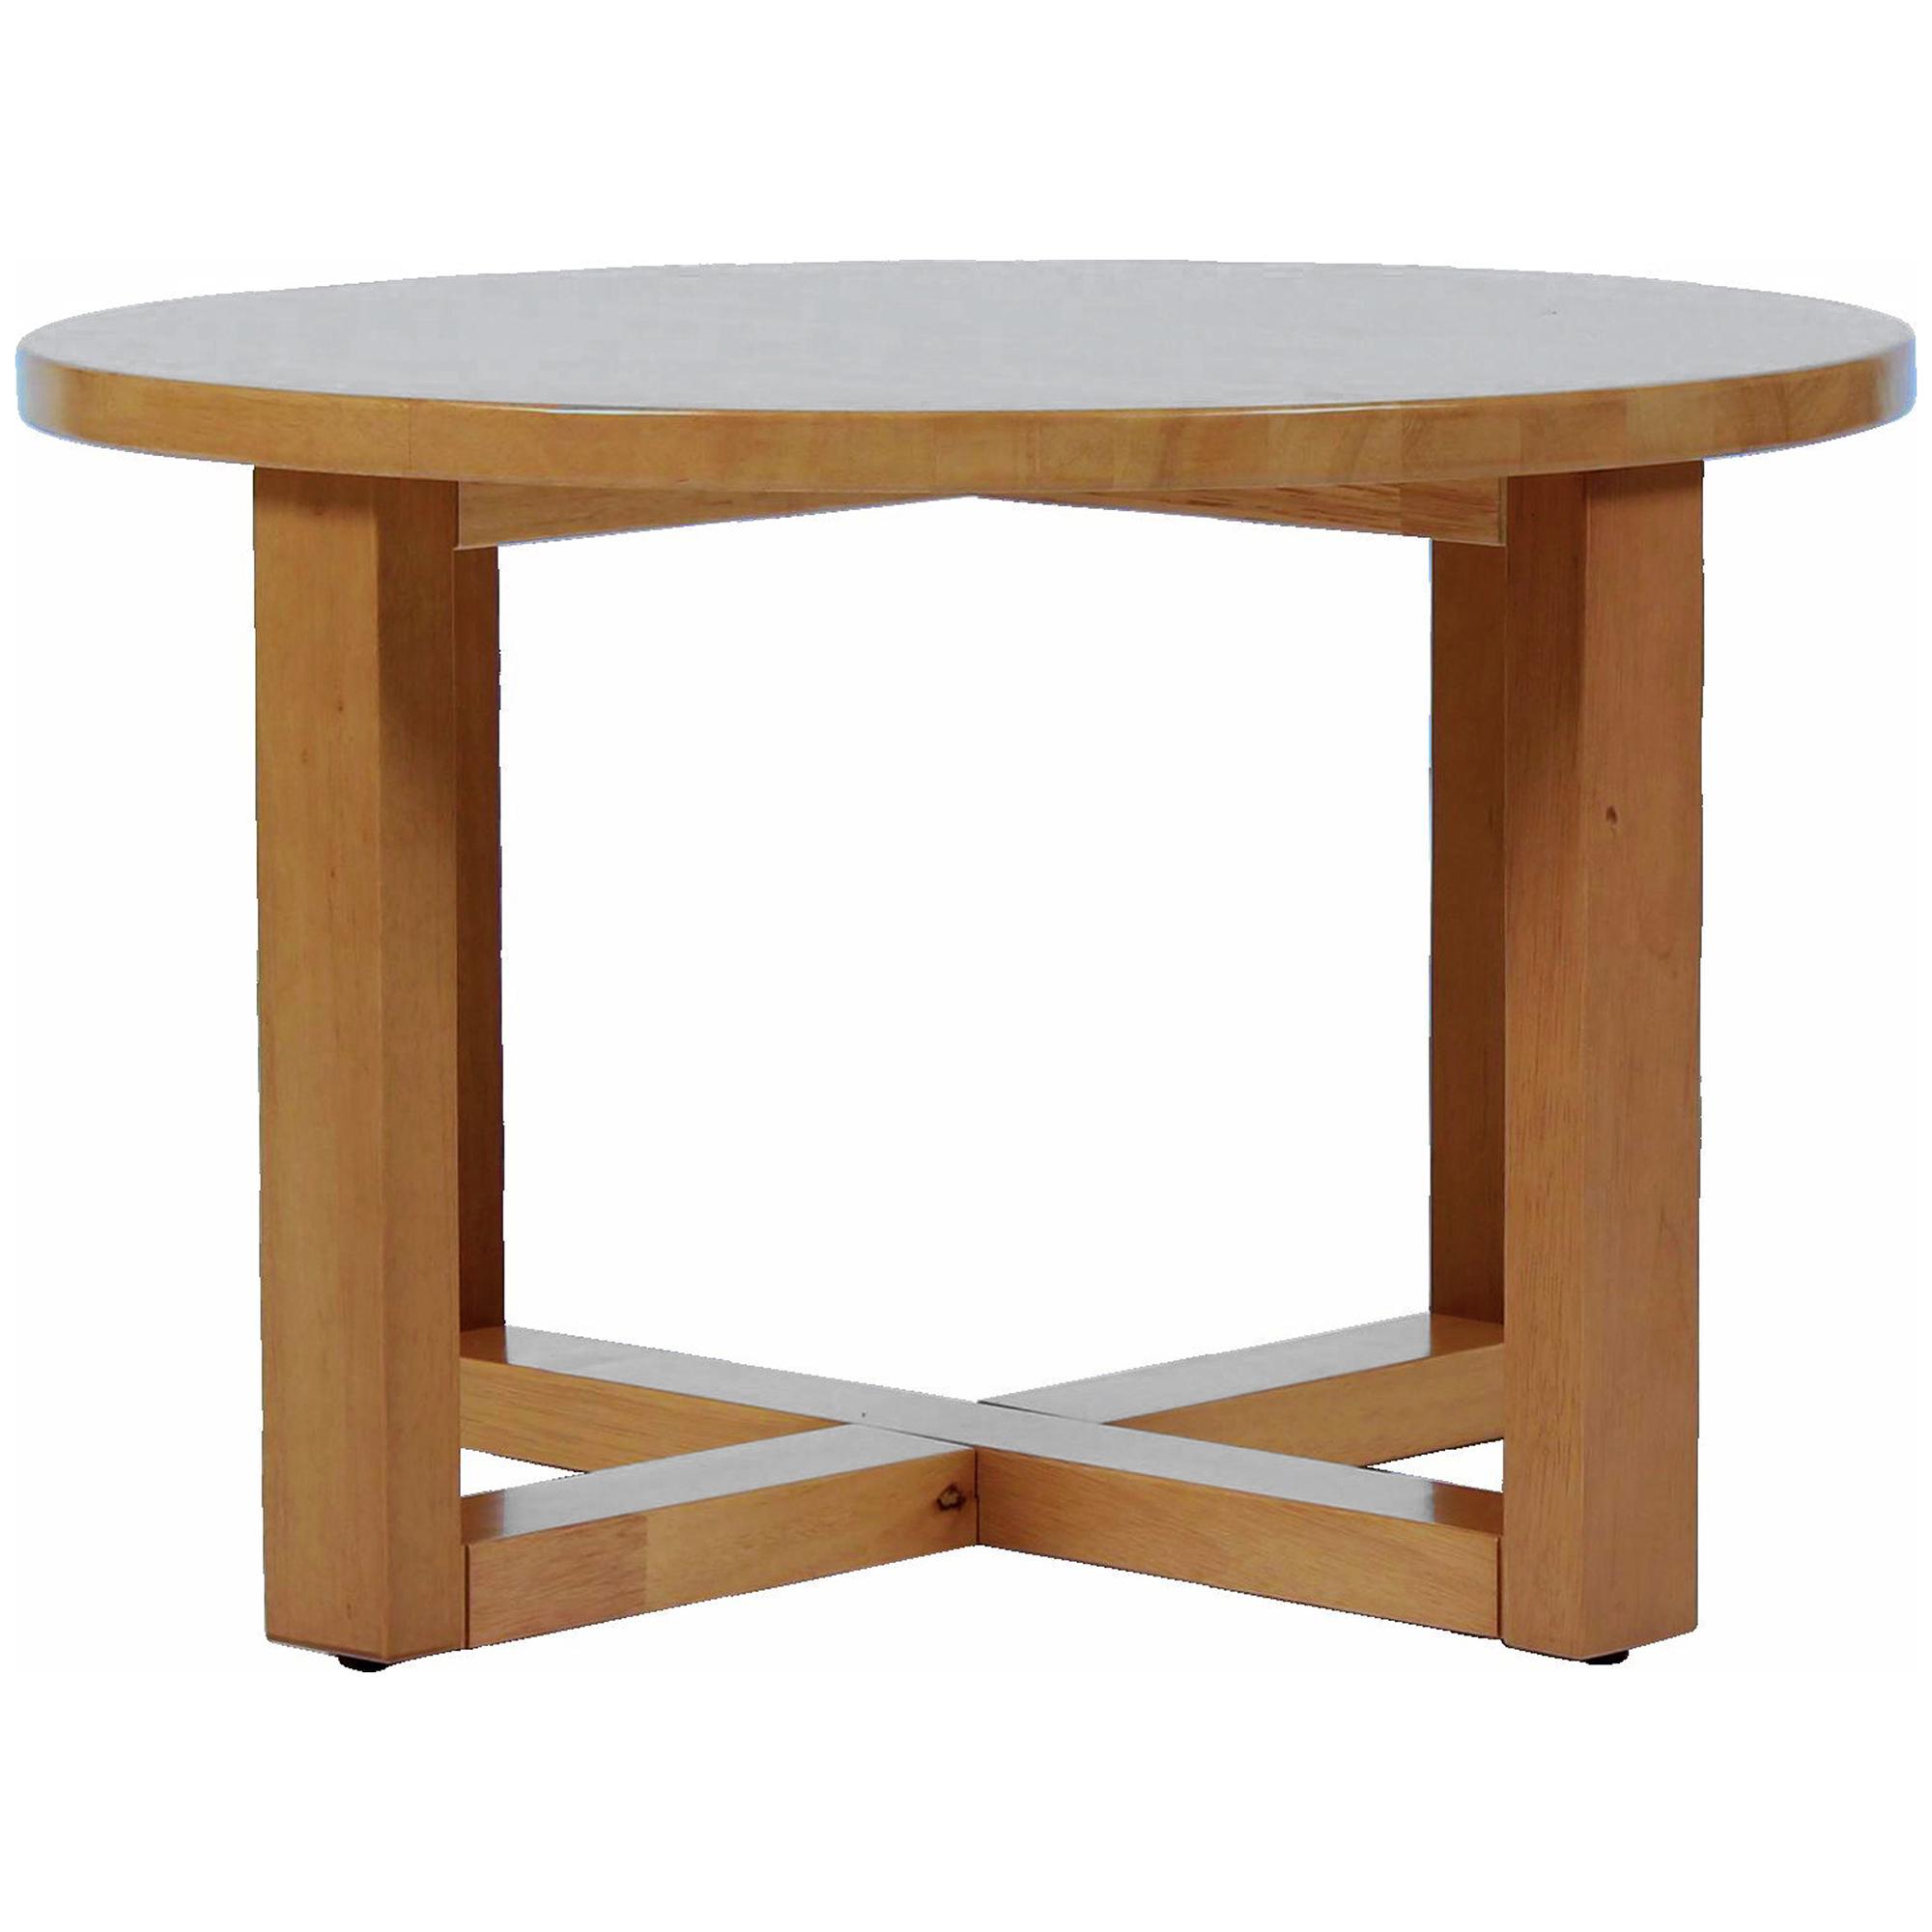 Rubberwood Coffee Table.Natural Chunk Rubberwood Coffee Table